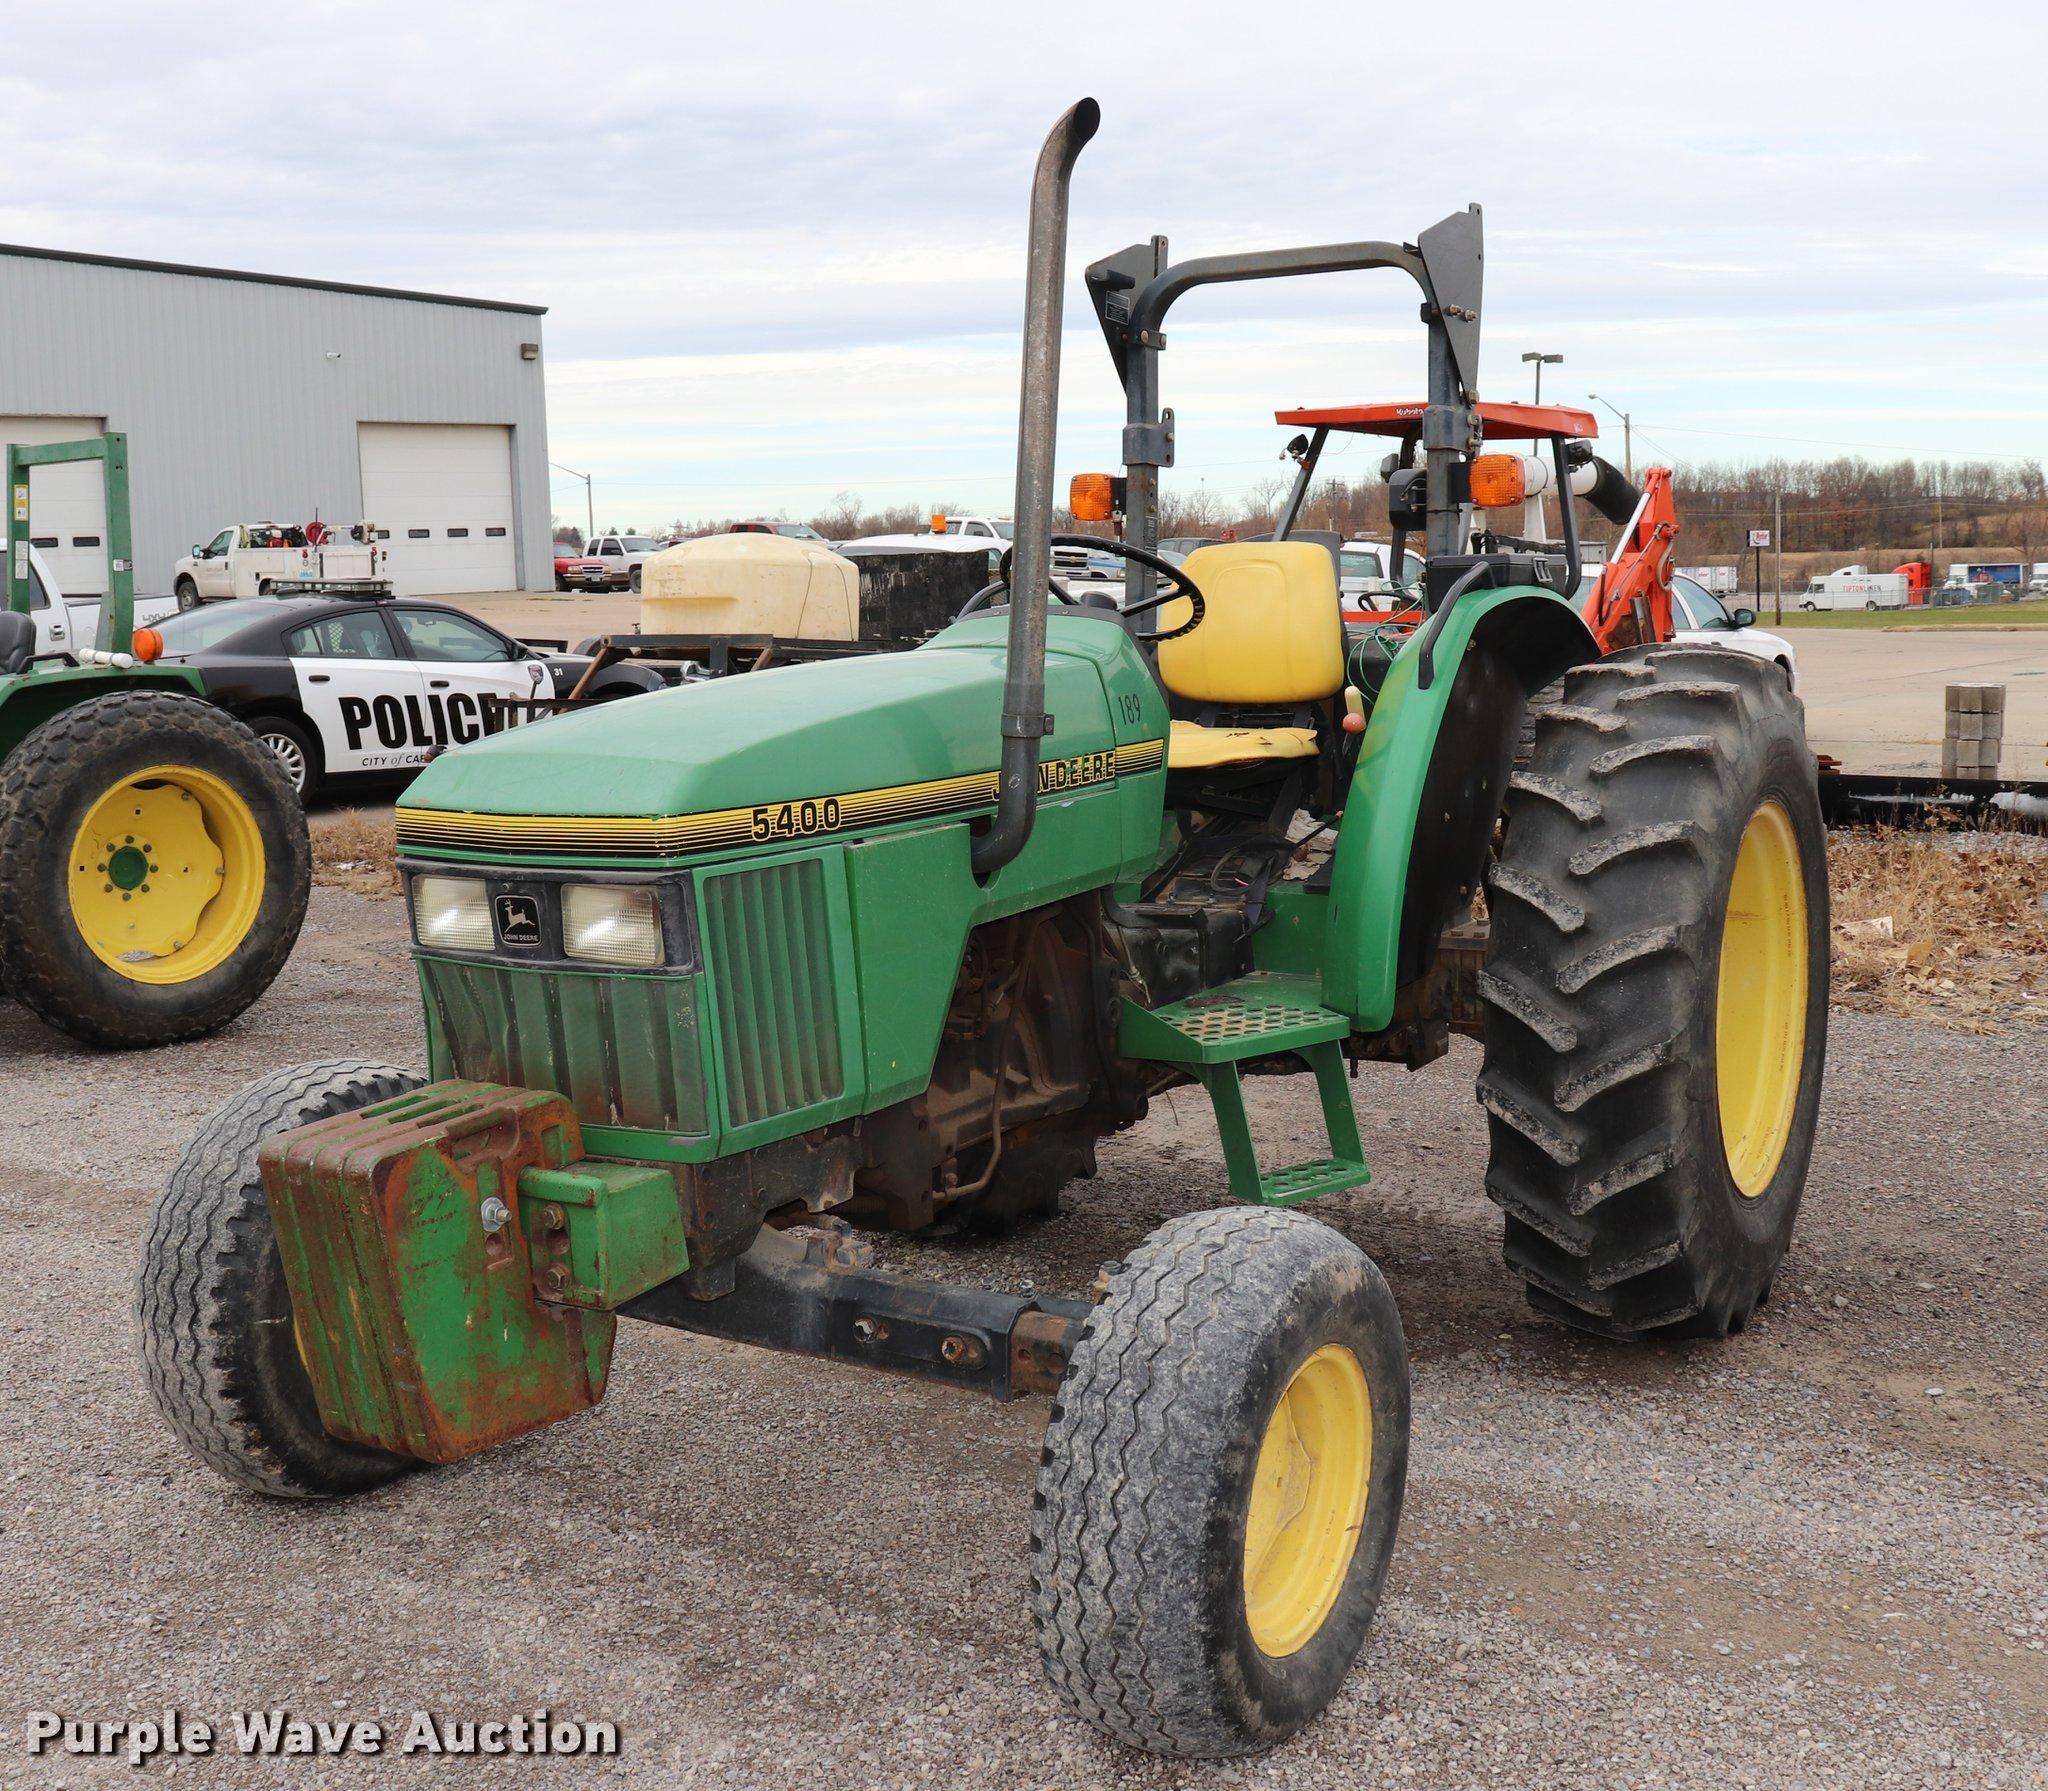 John Deere 5400 Tractor Item Ec9287 Sold December 27 Ve. Ec9287 For Item John Deere 5400 Tractor. John Deere. John Deere 5400 Tractor Parts Diagram At Scoala.co